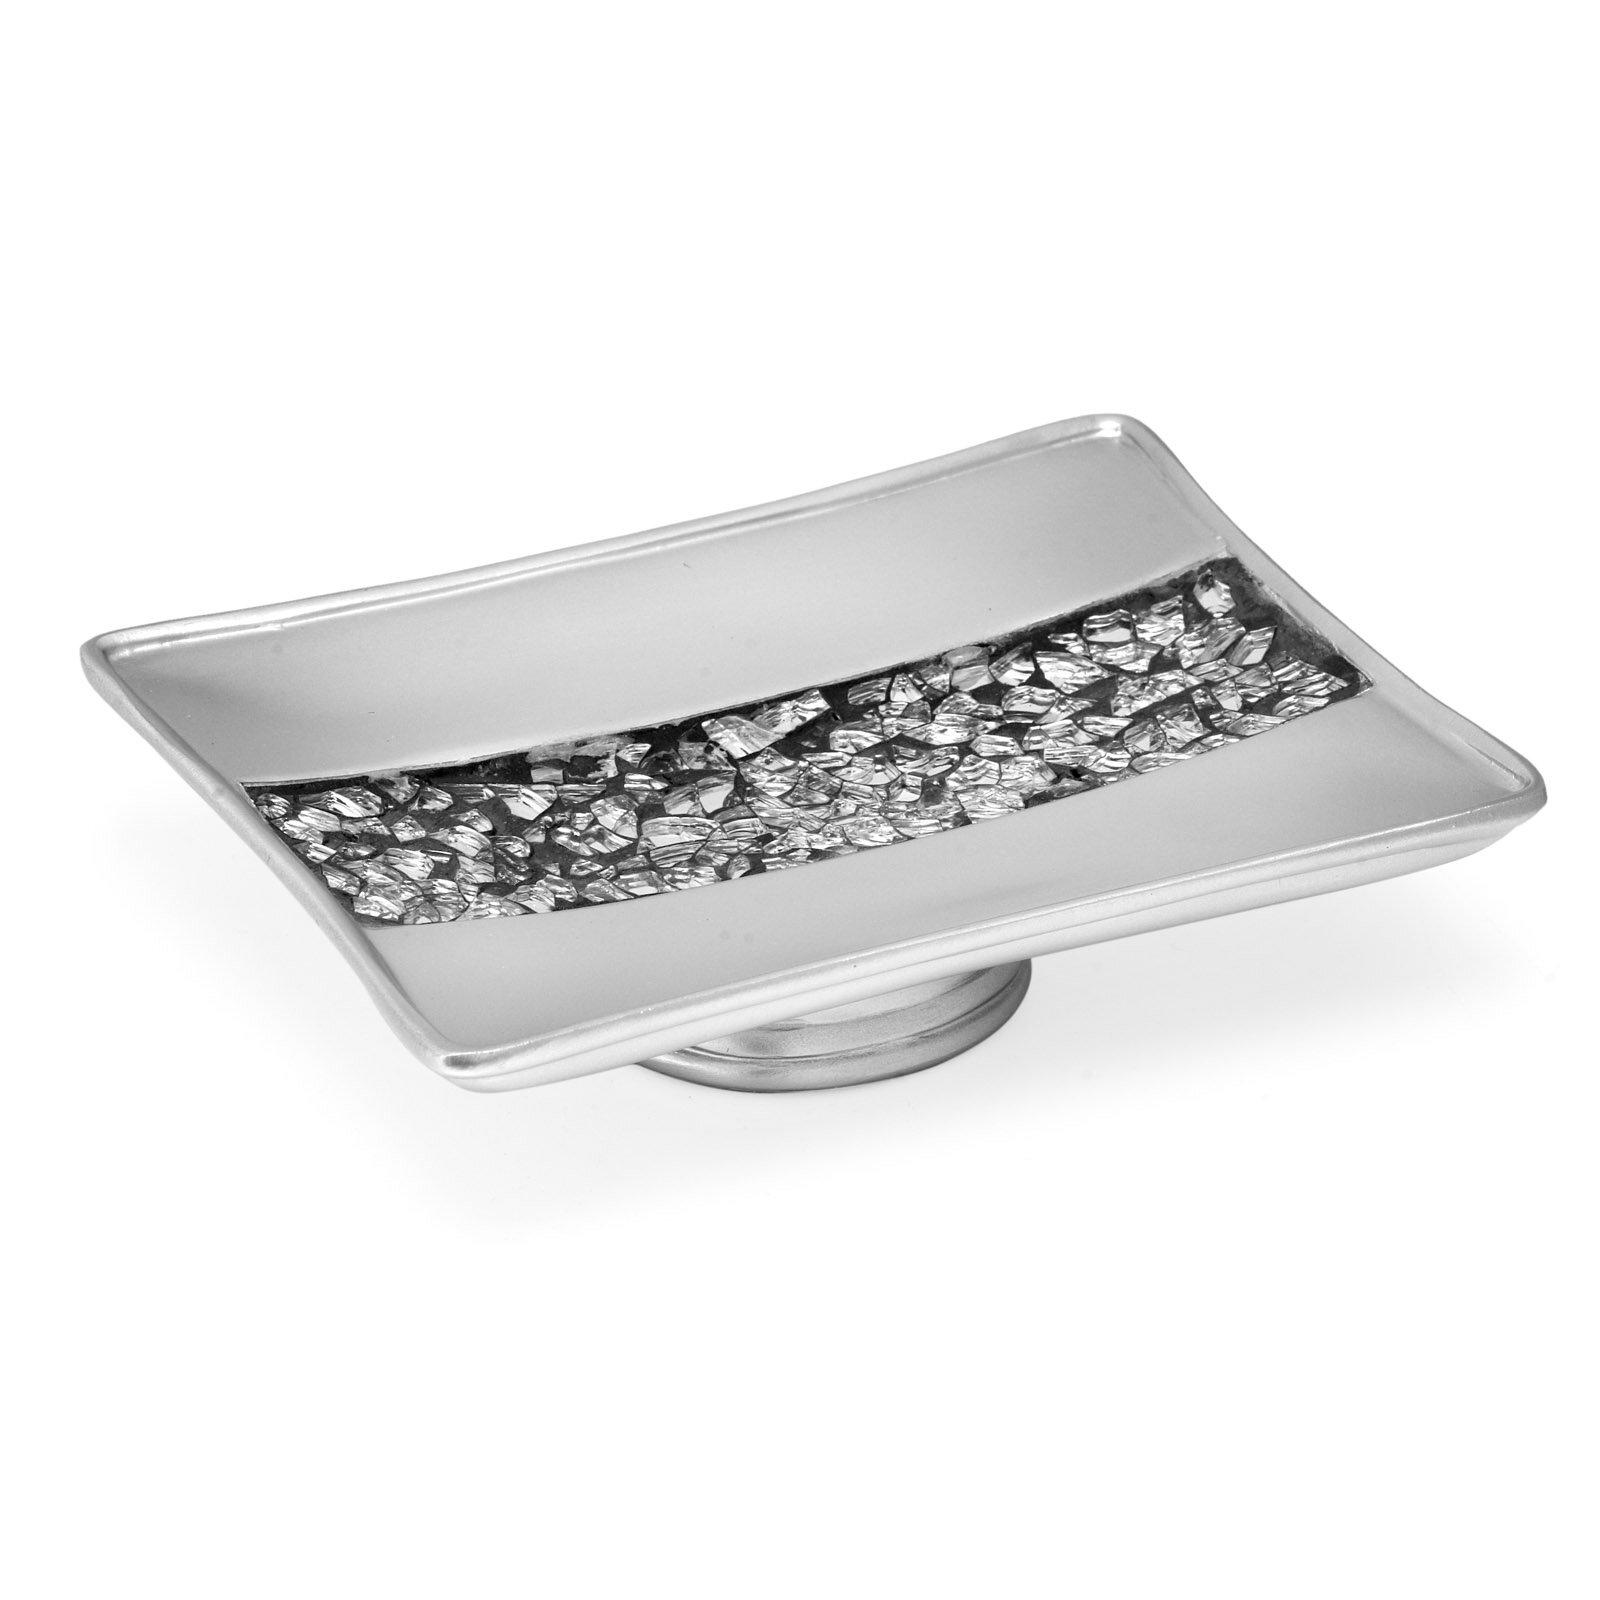 Popular Bath Products Sinatra Soap Dish Amp Reviews Wayfair Ca